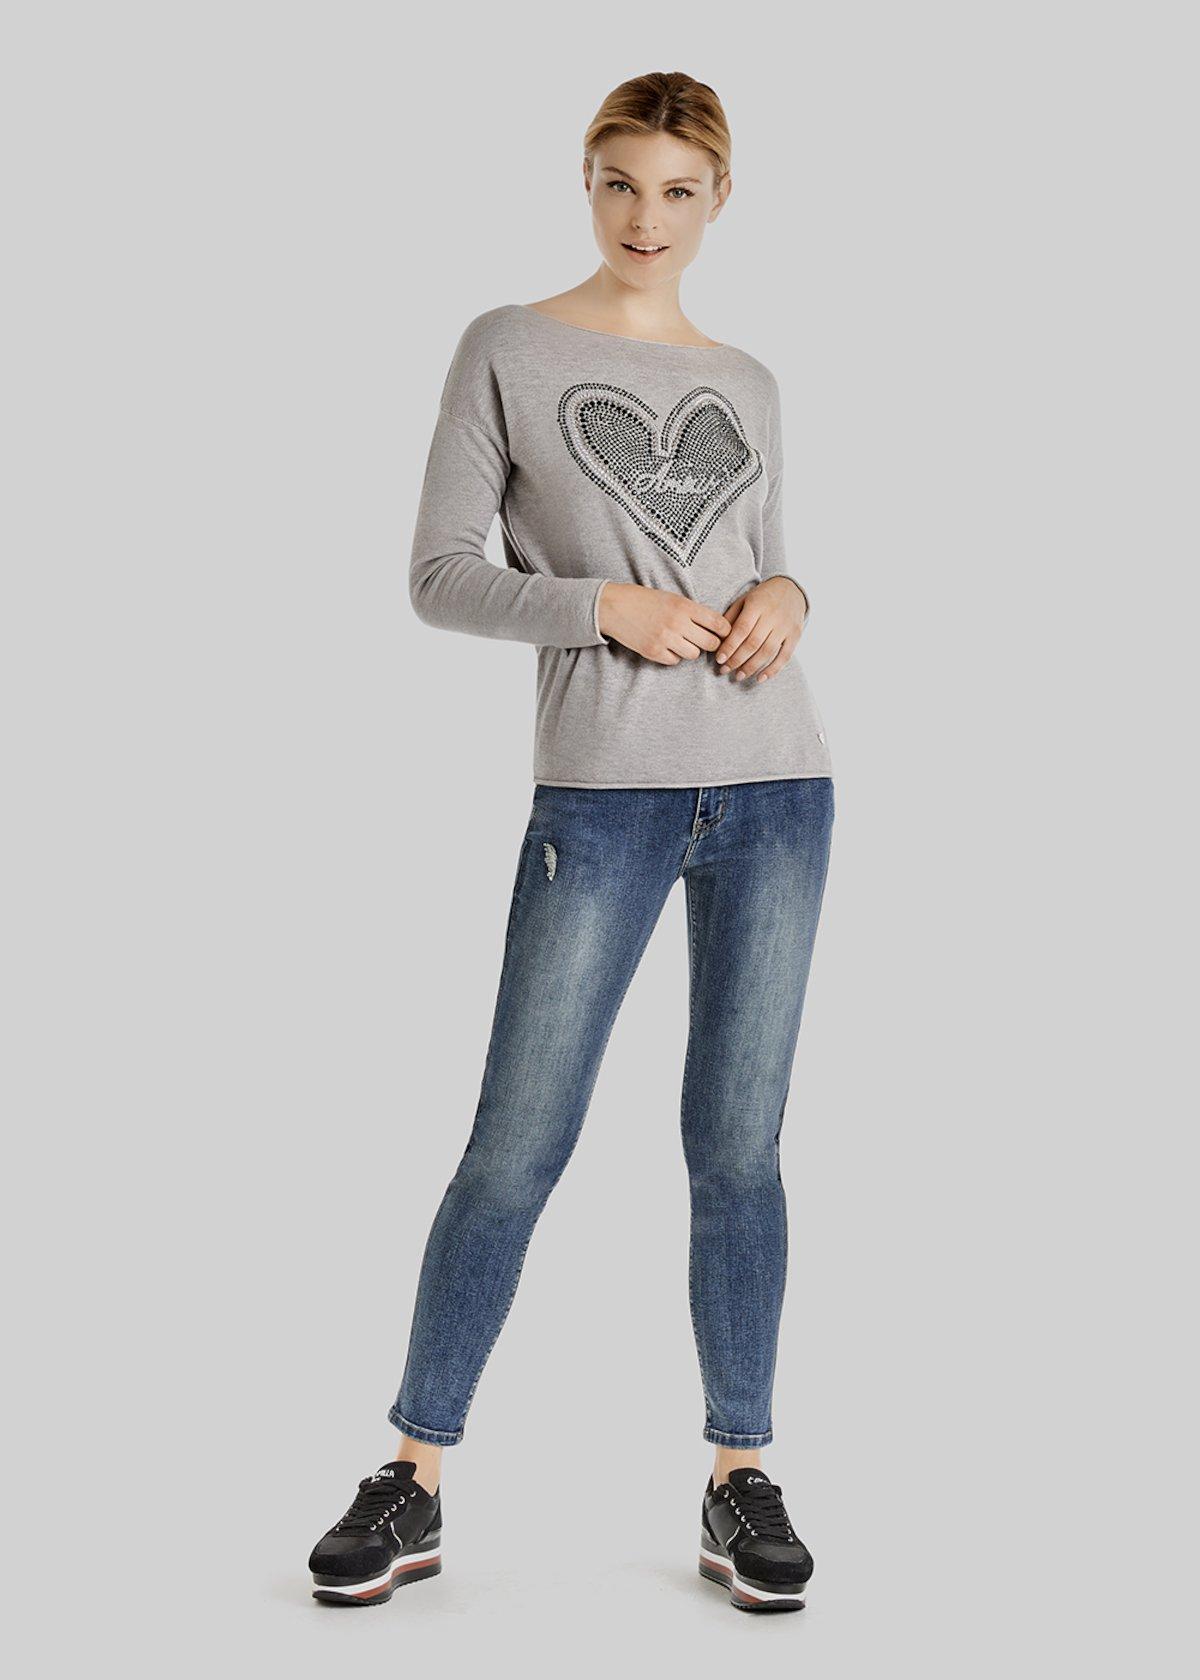 Maky sweater with a heart detail of micro rhinestones - Grey Melange 6f10335cdb4